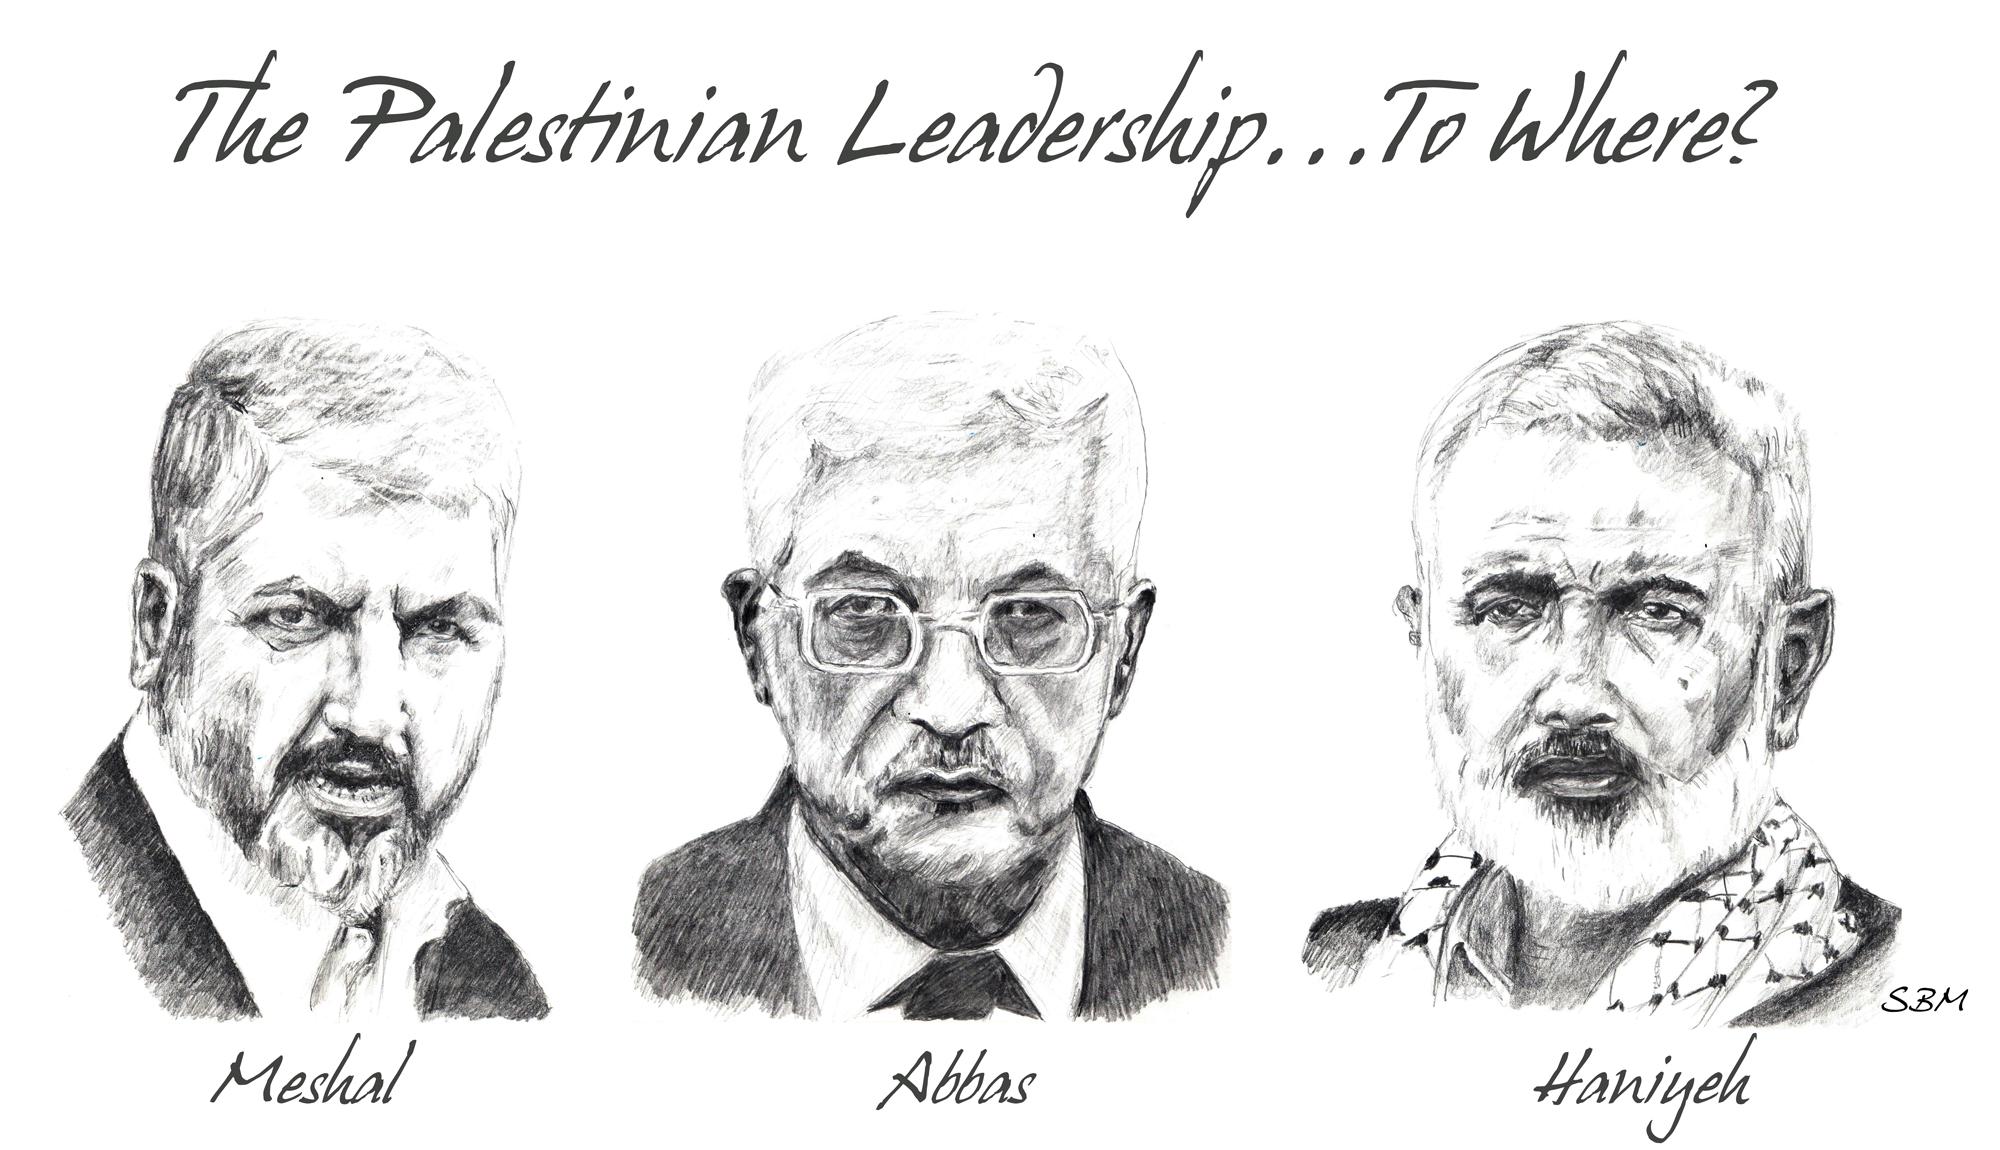 Alon Ben Meir The Palestinian Leadership To Where